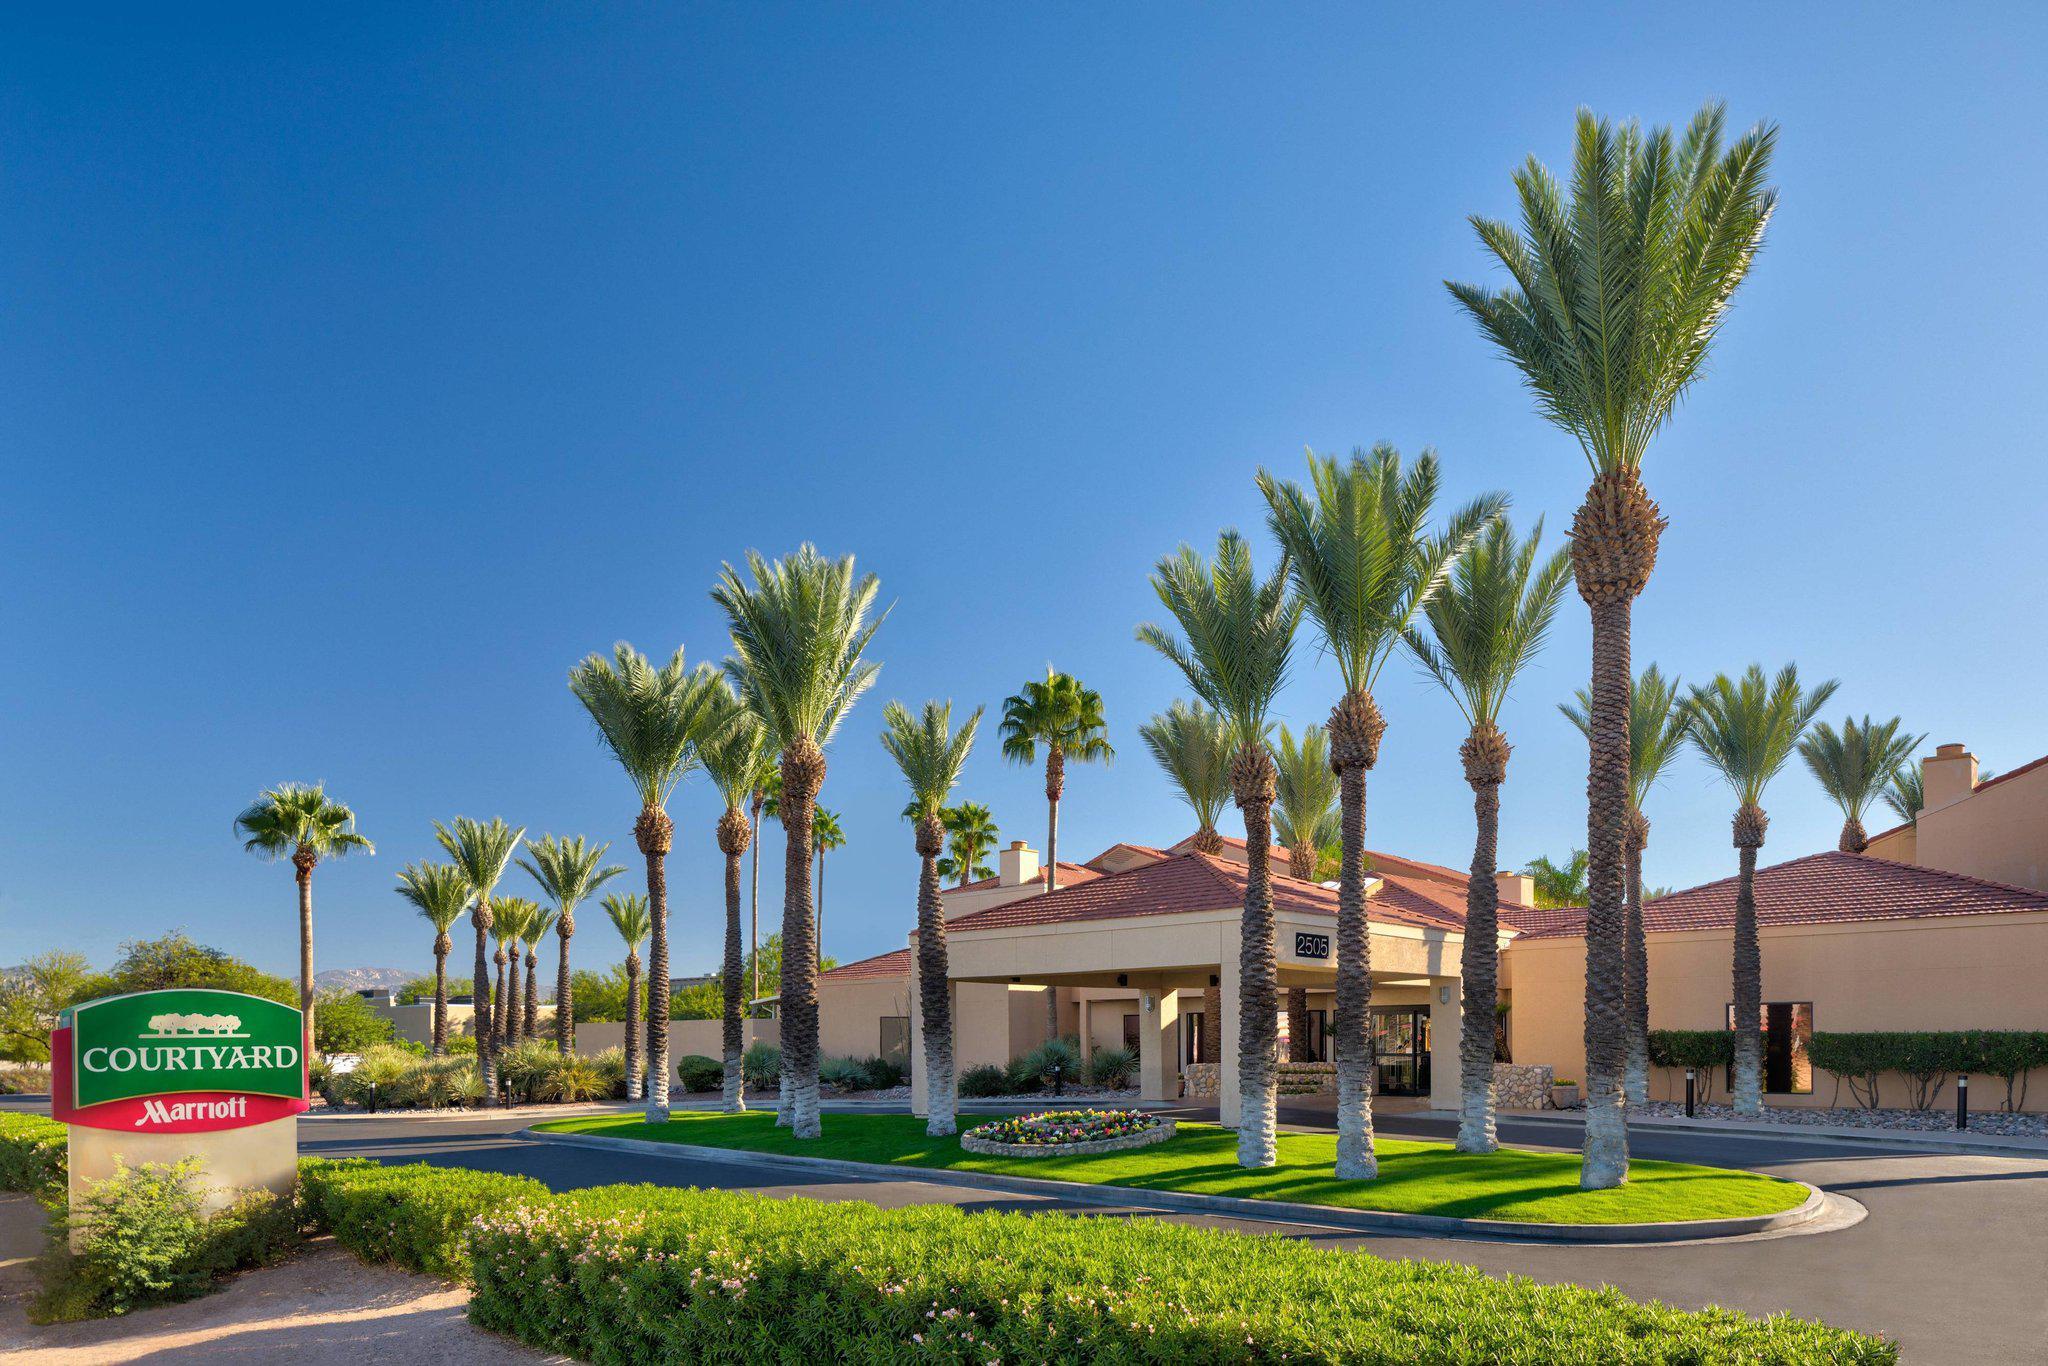 Courtyard by Marriott Tucson Airport